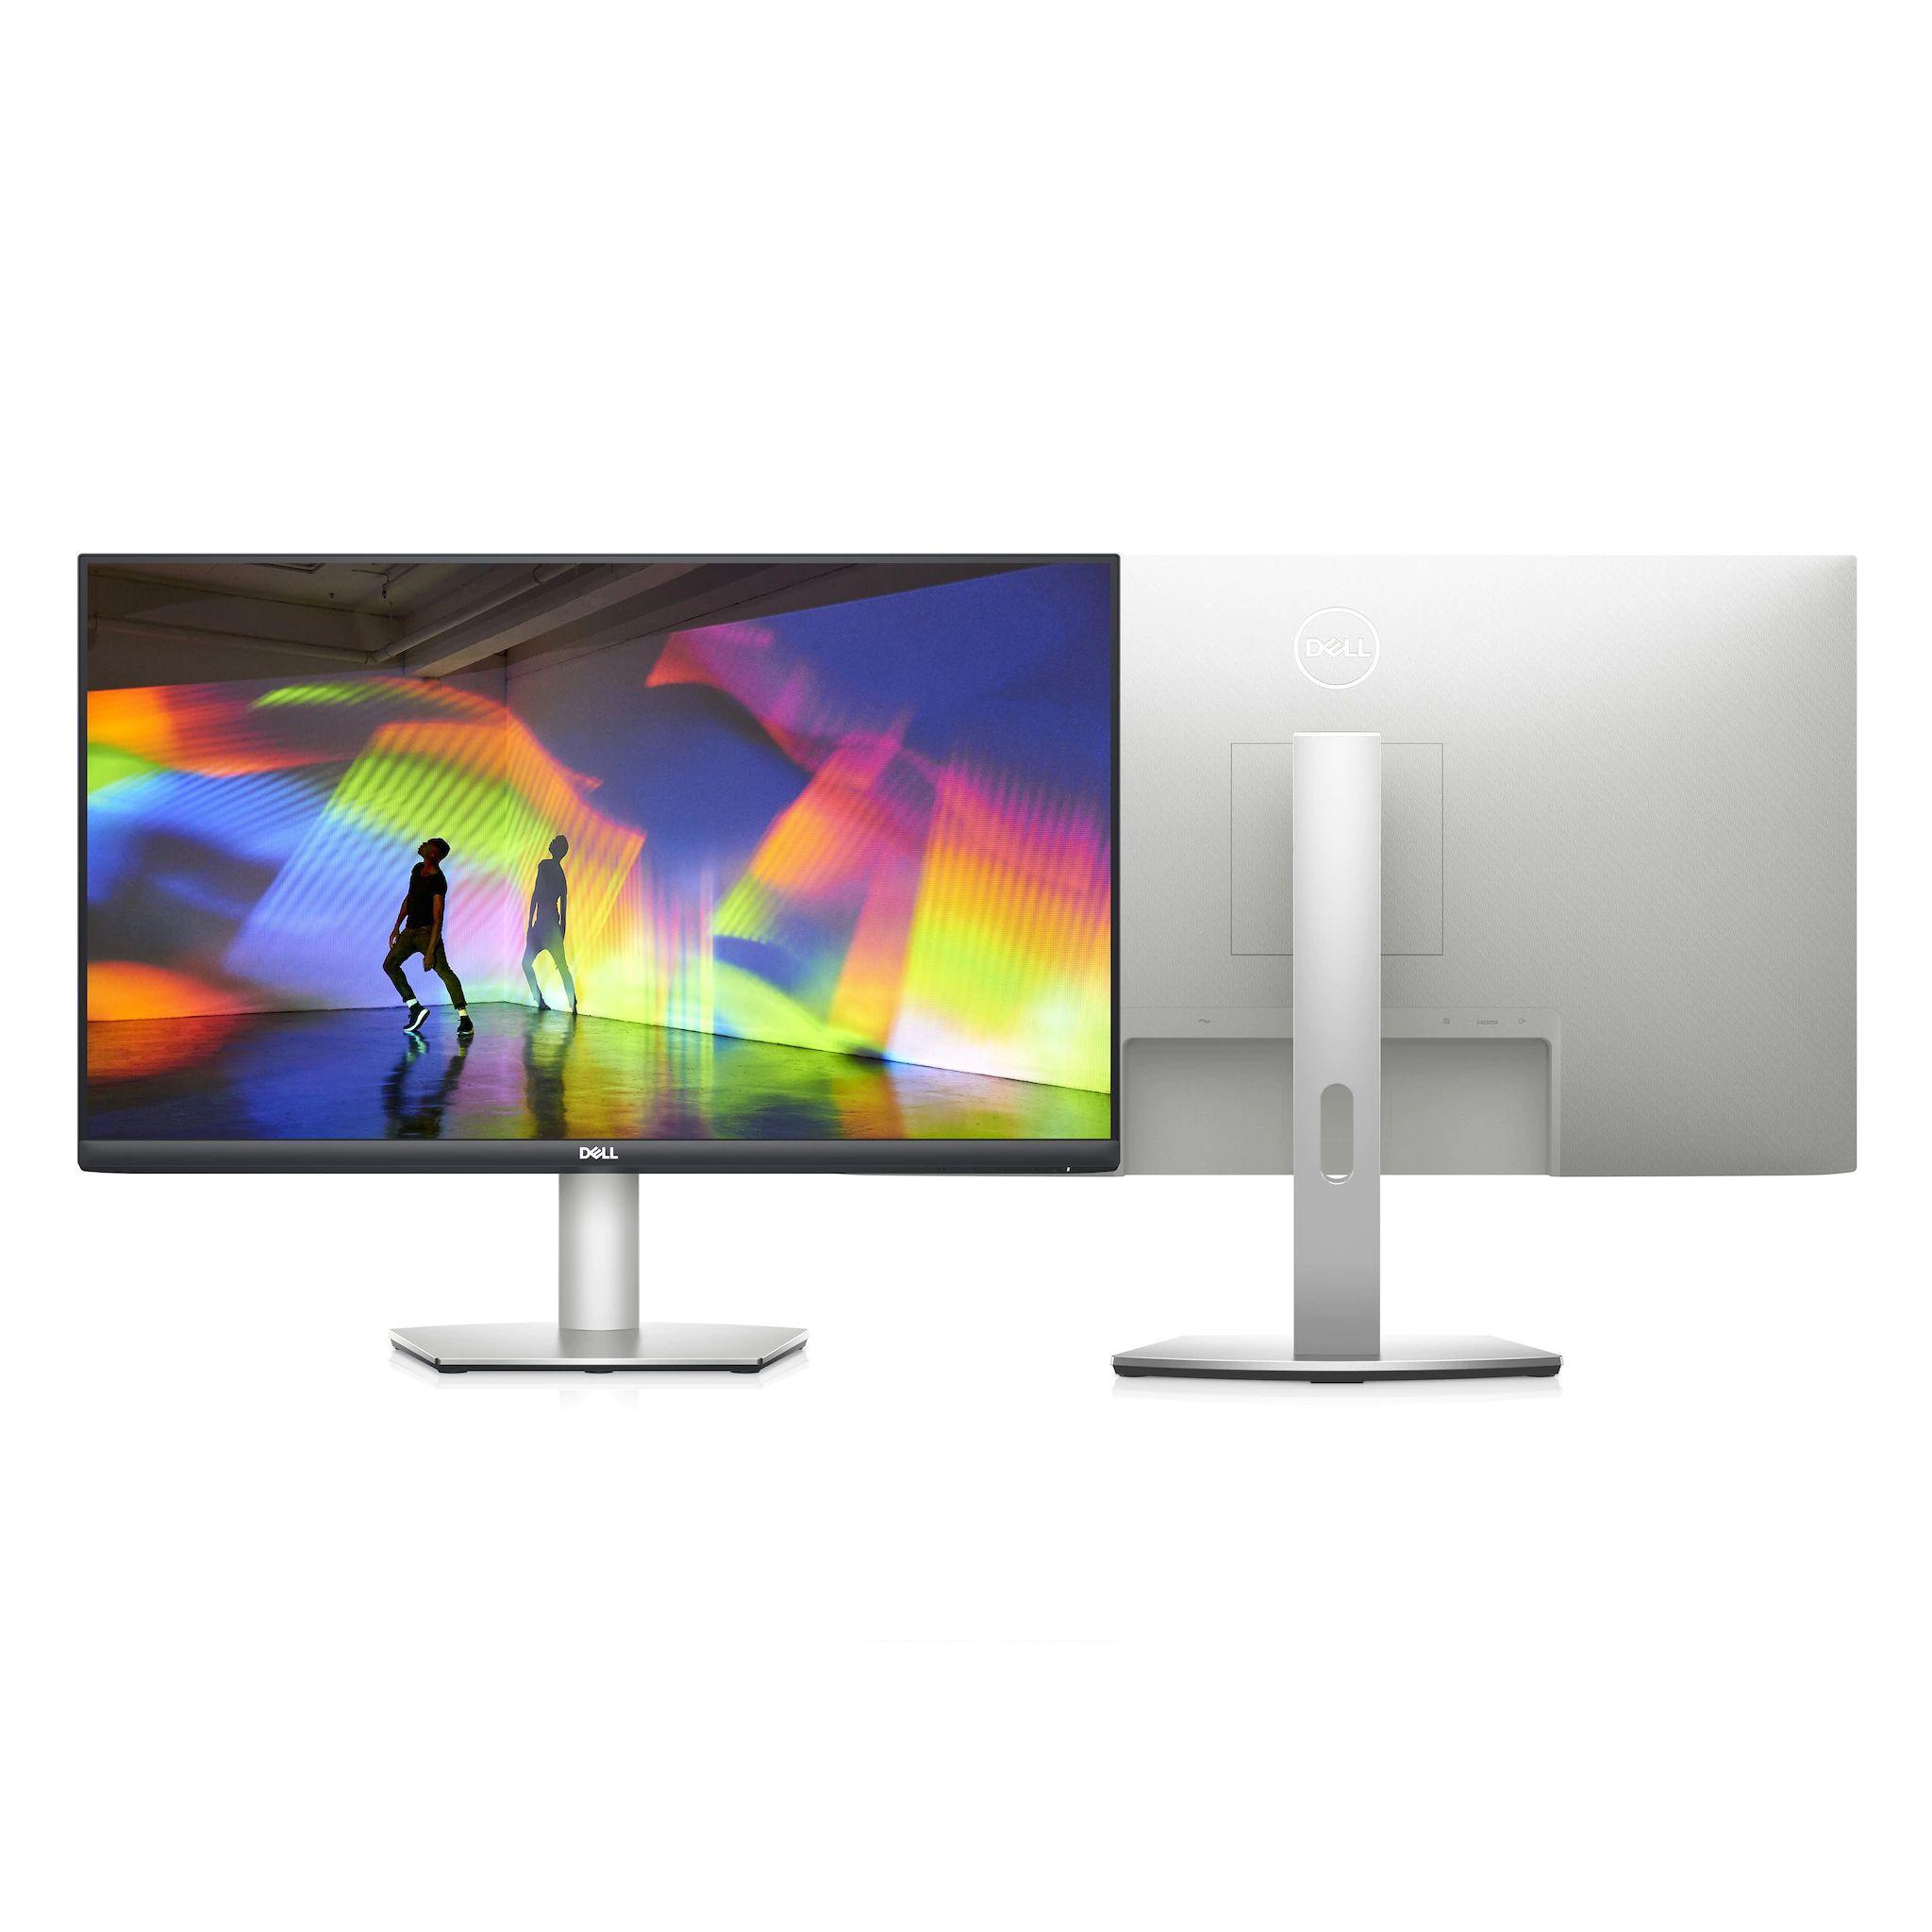 "Écran PC 27"" Dell S2721HS - LED, Full HD, Dalle IPS, 75 Hz, 4 ms, FreeSync"